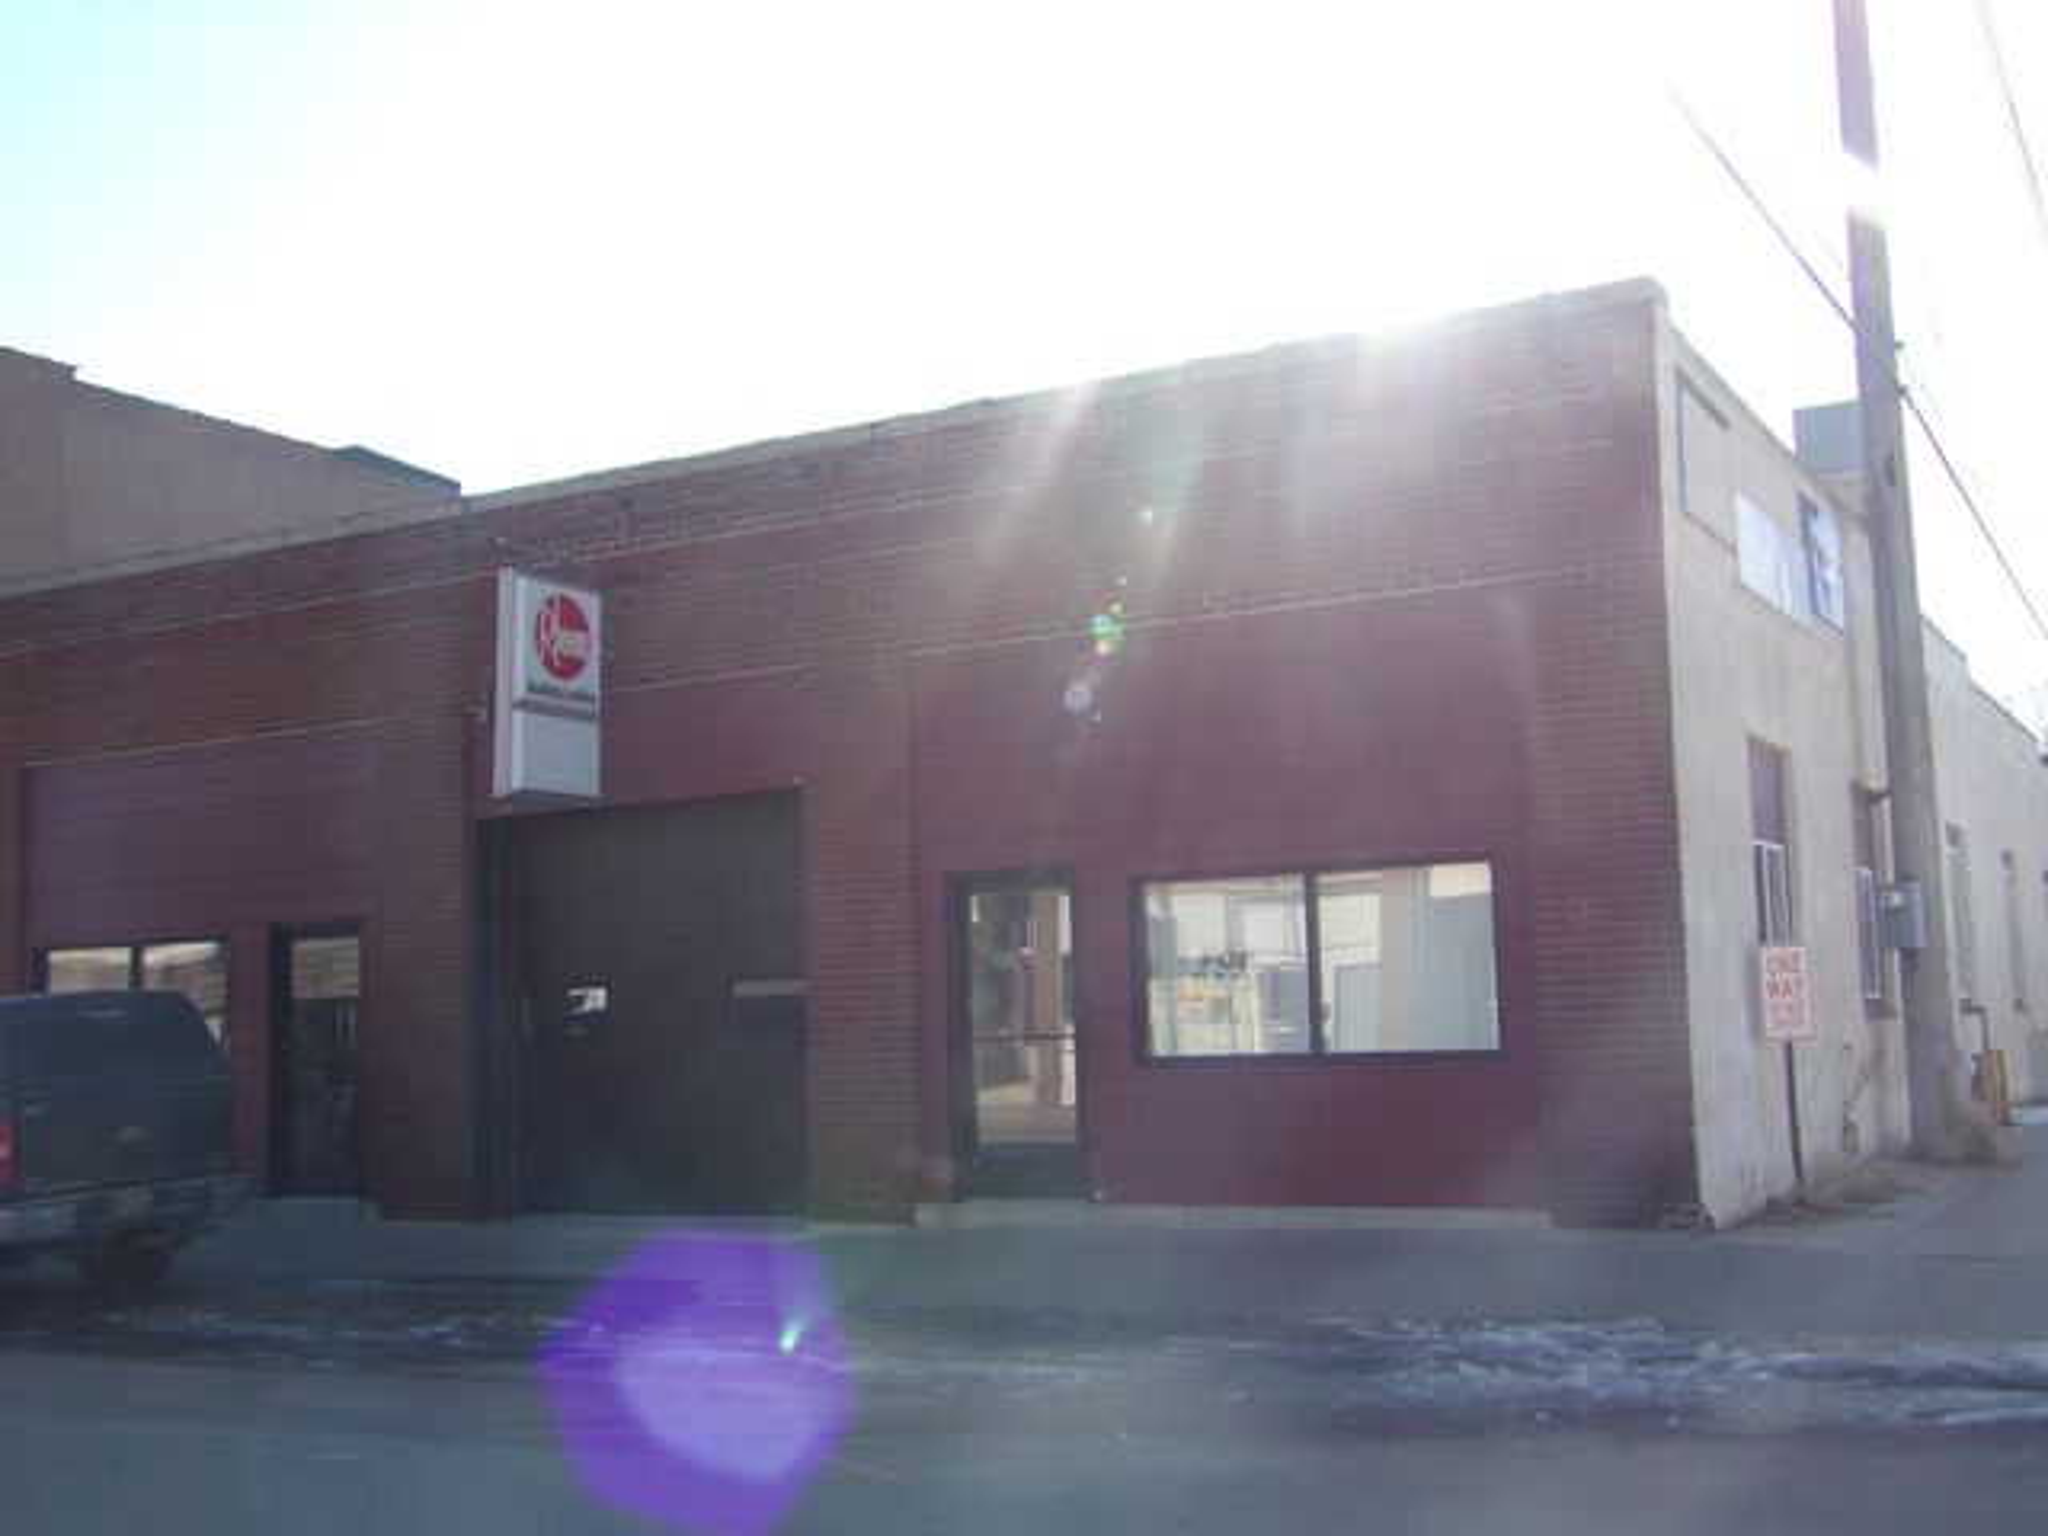 115 E 1st Ave, Mitchell, SD 57301